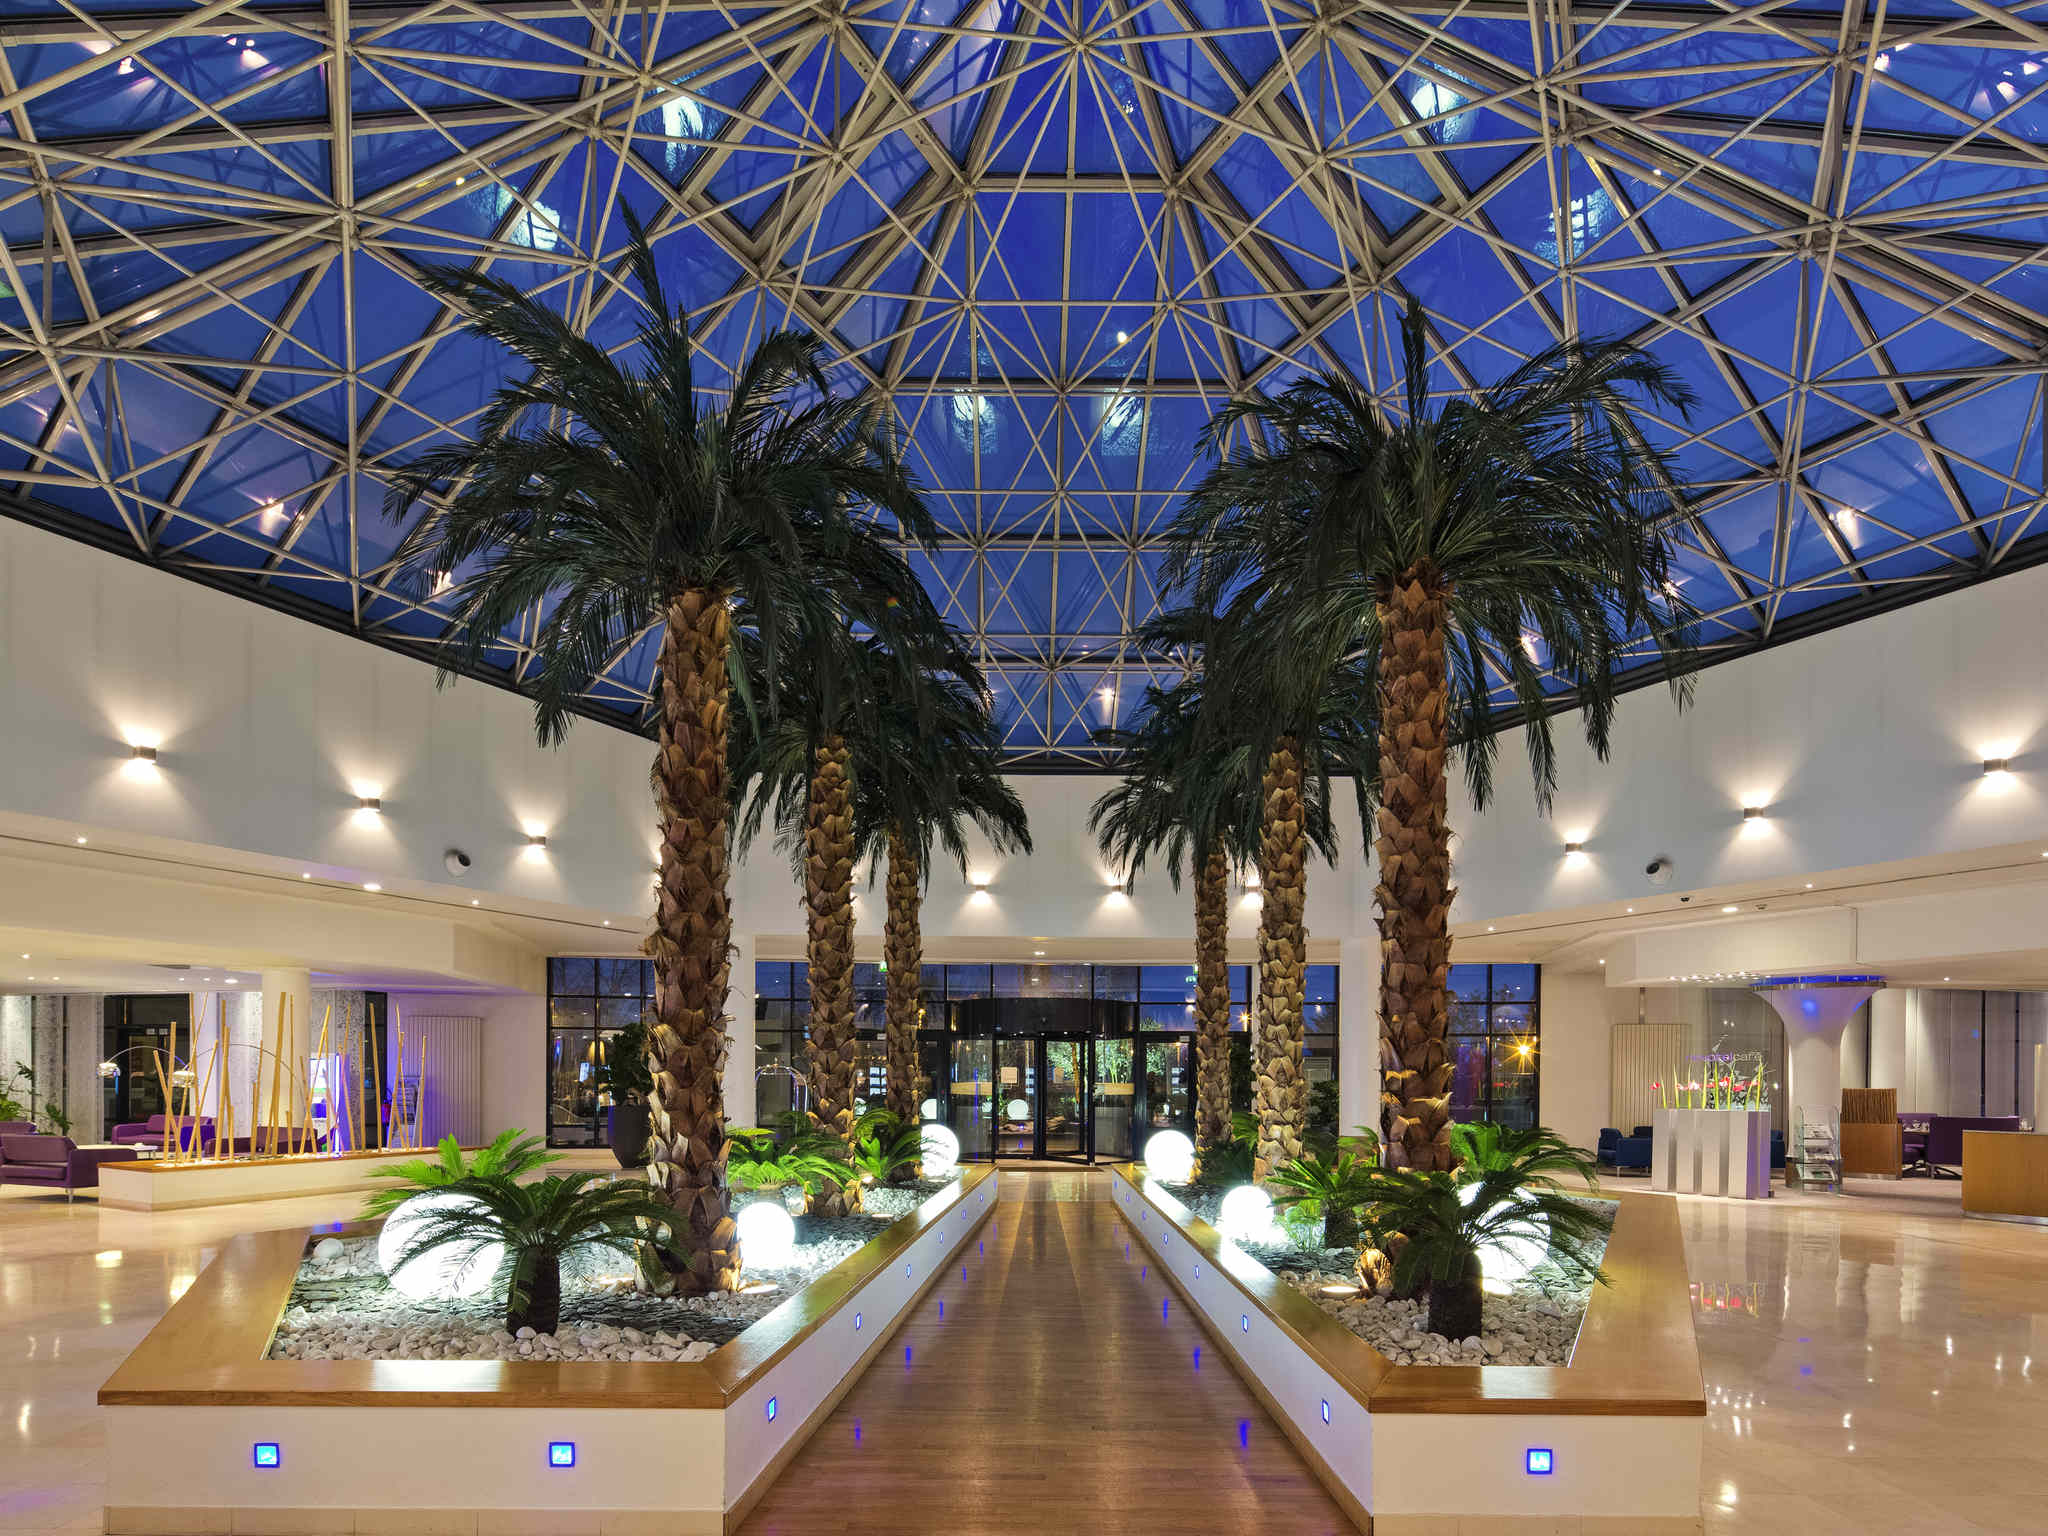 Hotell – Novotel Convention & Wellness Roissy CDG